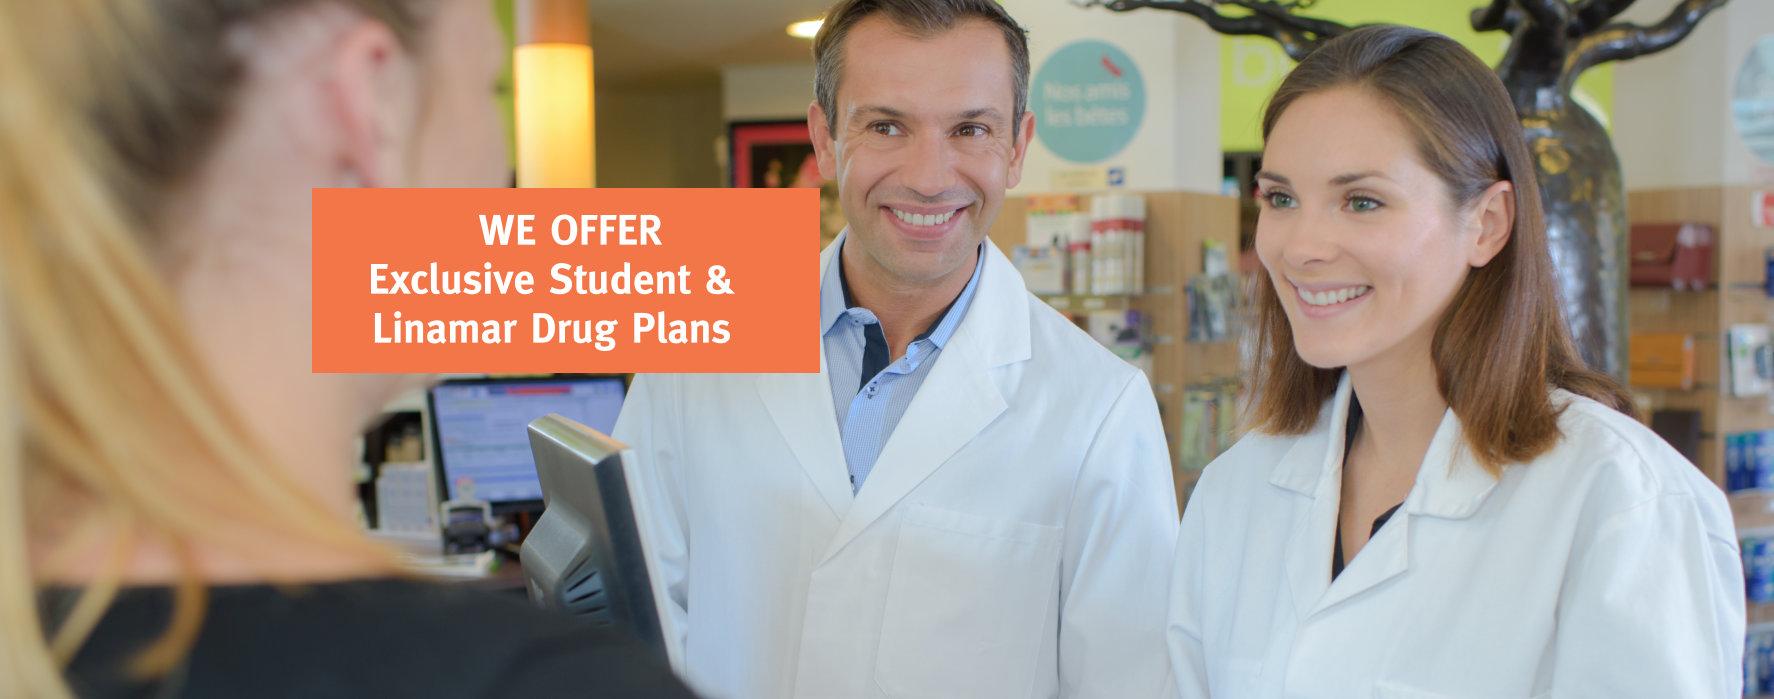 WE OFFER Exclusive Student & Linamar Drug Plans